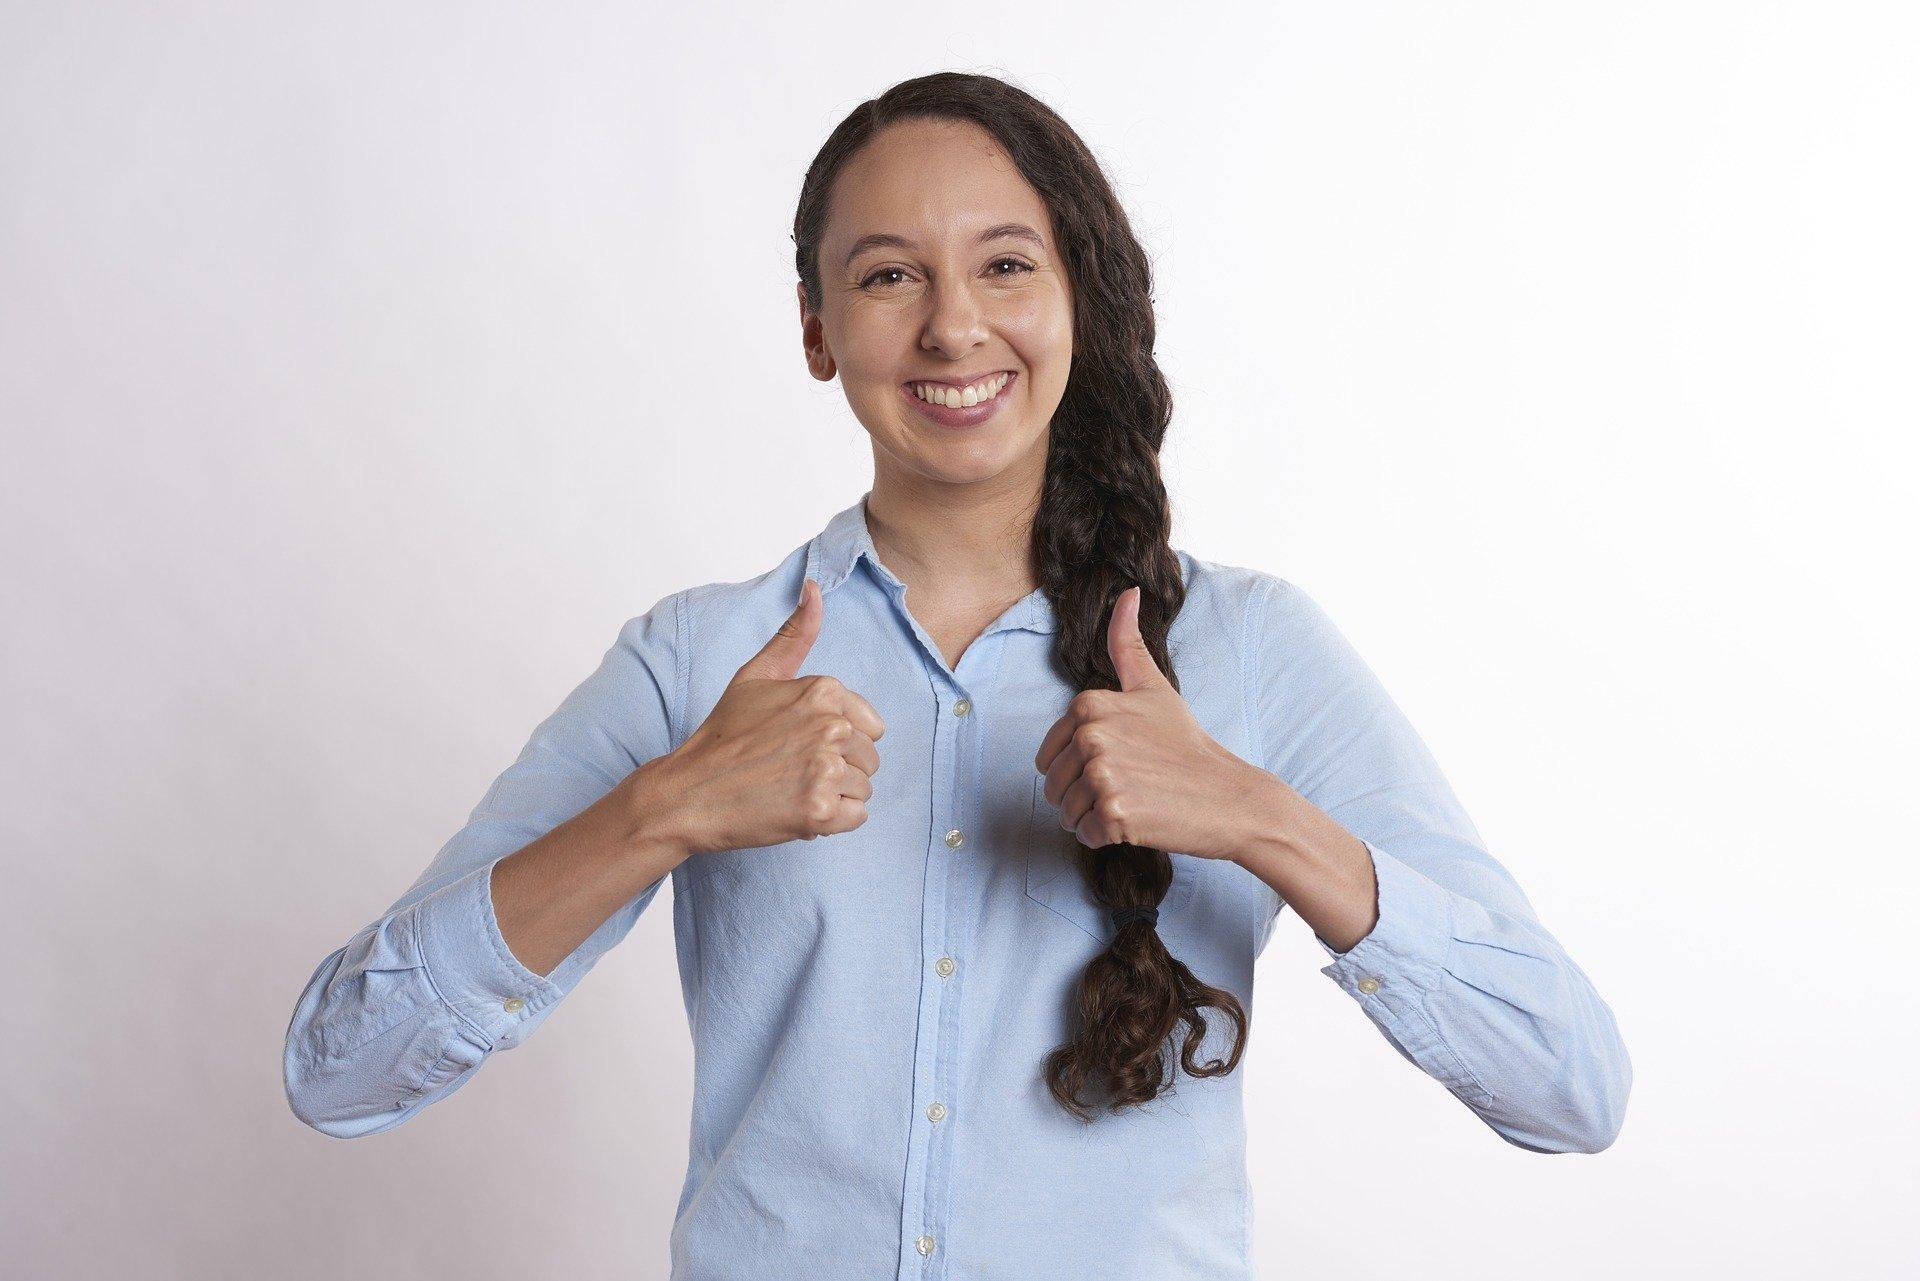 Effective Ways to Show Employee Appreciation